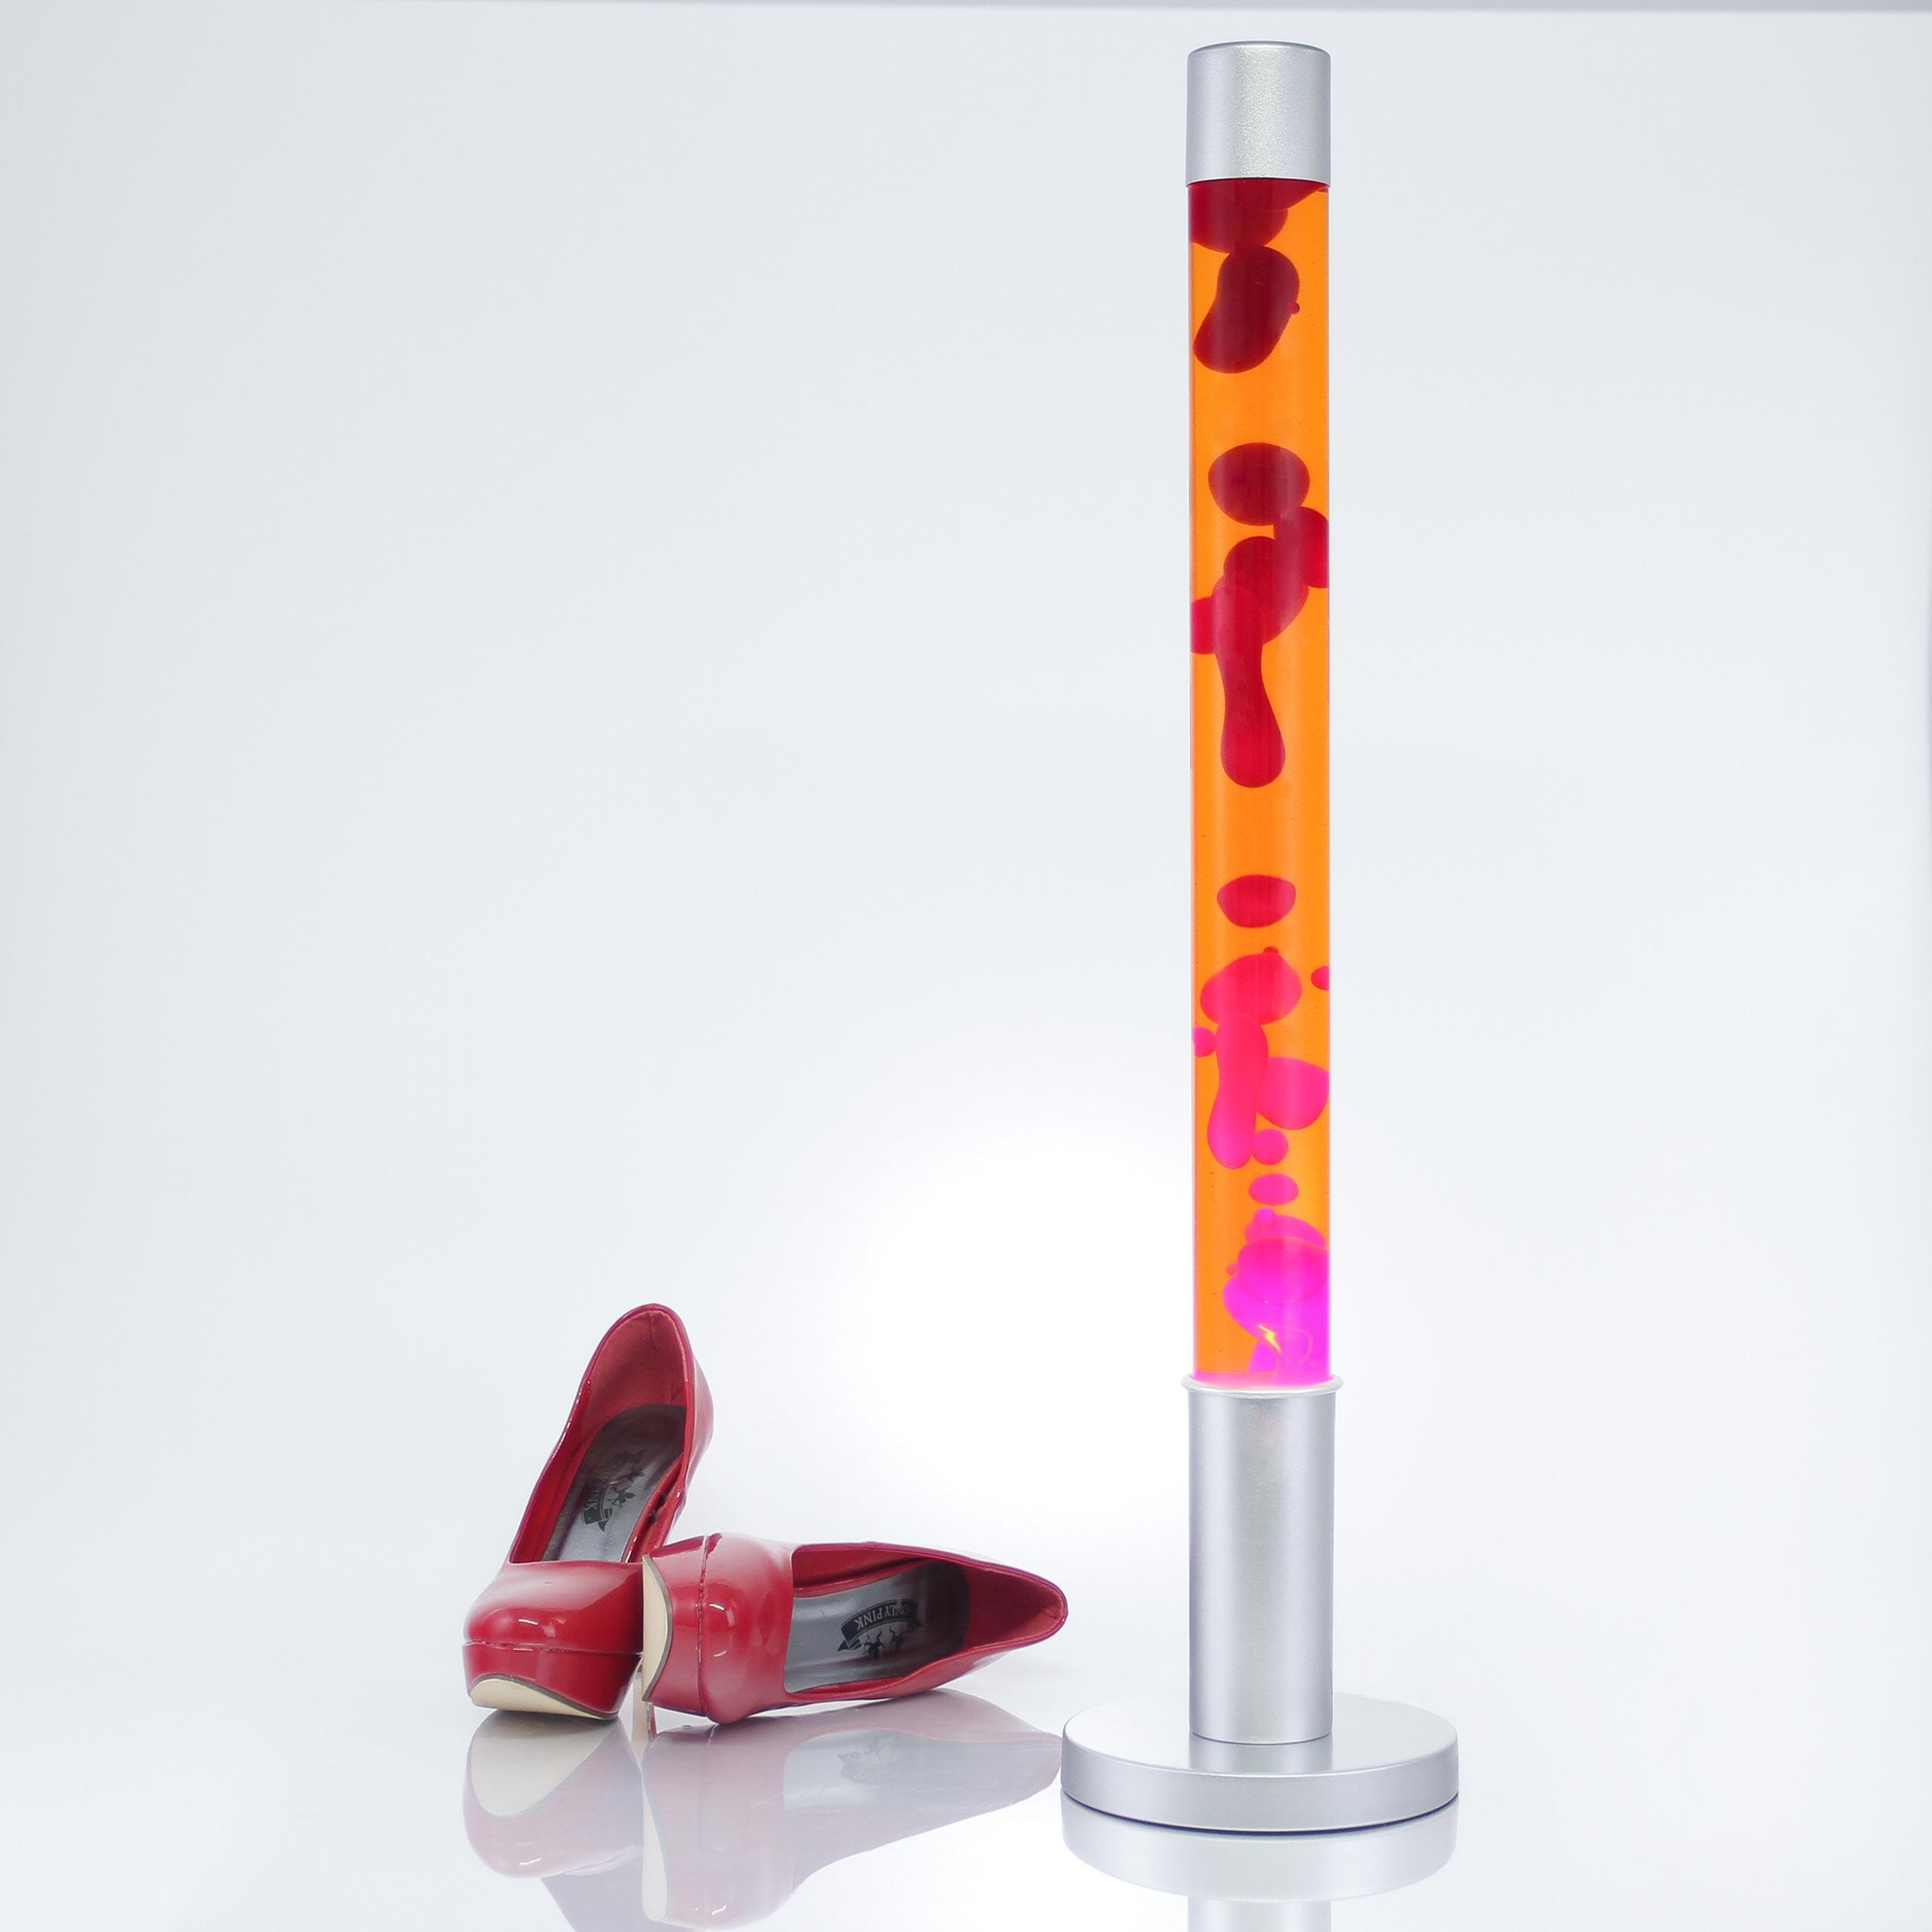 Lavaleuchte KOMPAKT Weiss Rot aus Glas inkl Leuchtmittel 25W 230V